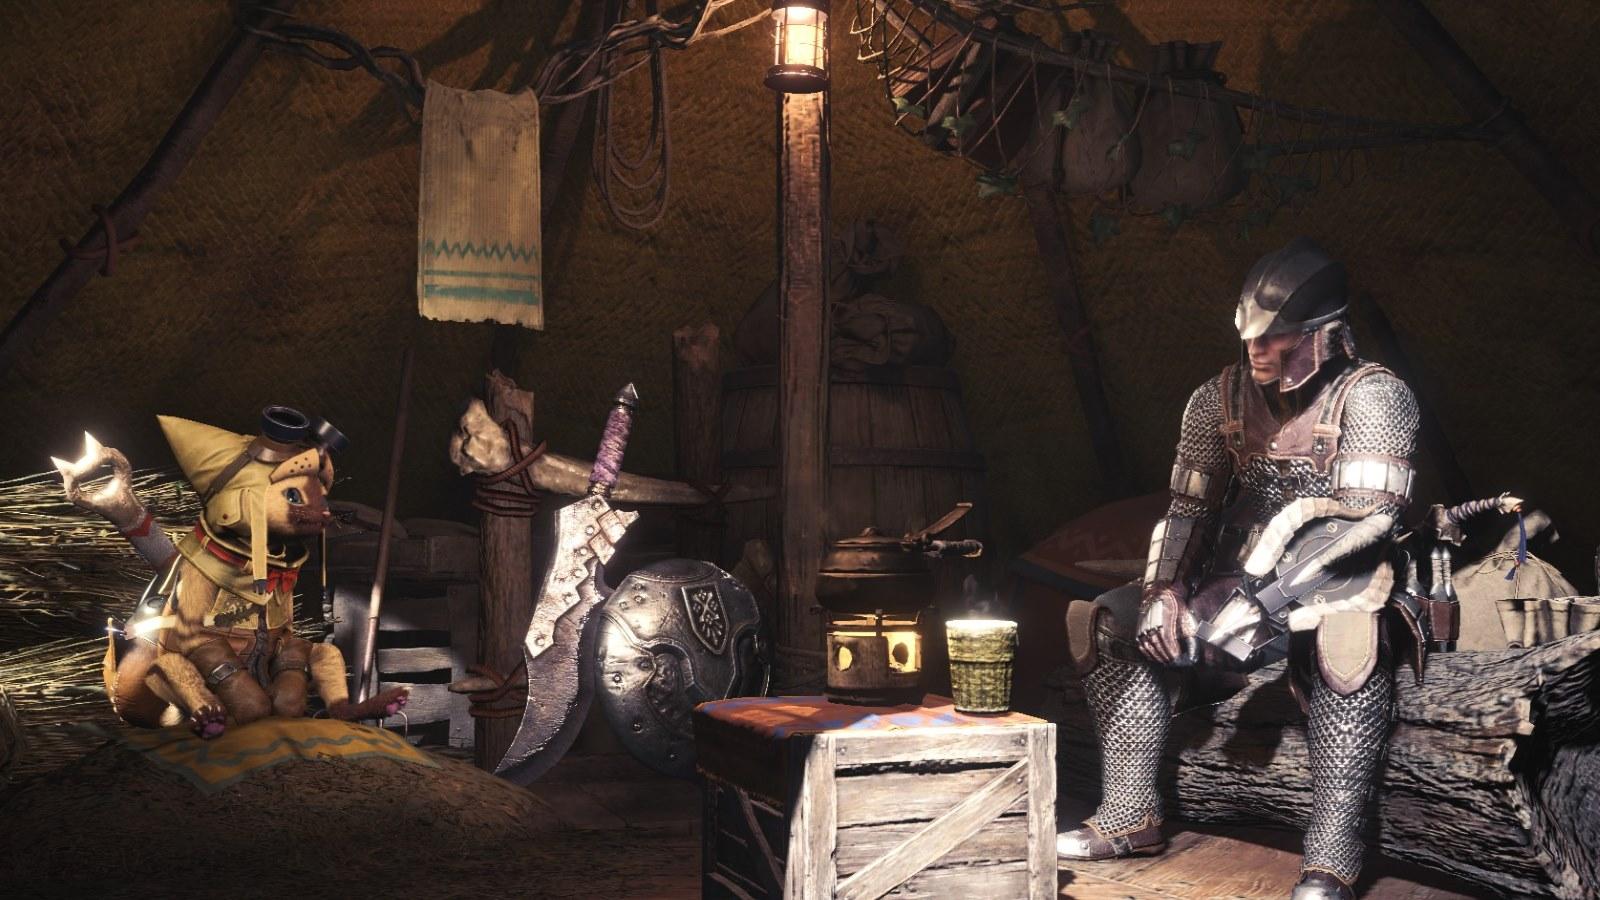 Monster Hunter: World adds free high resolution textures